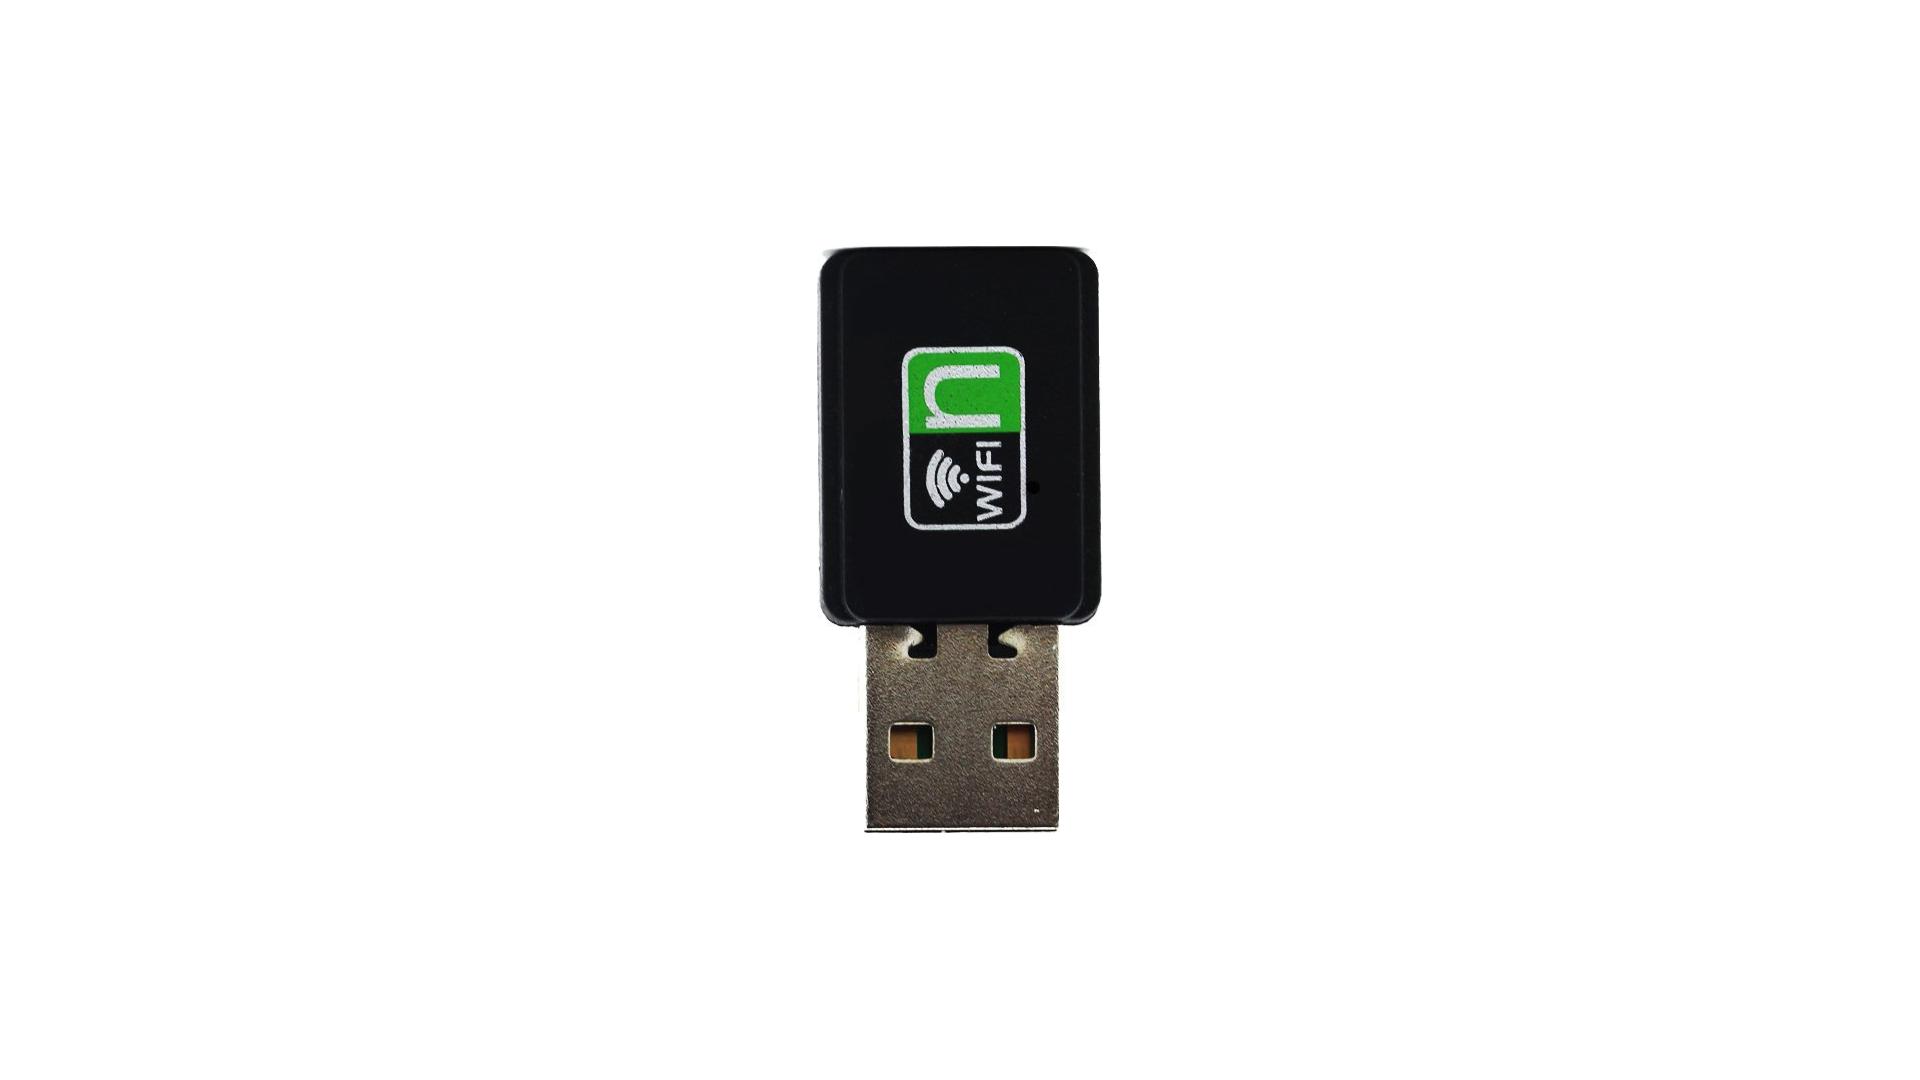 wifi-8188cus